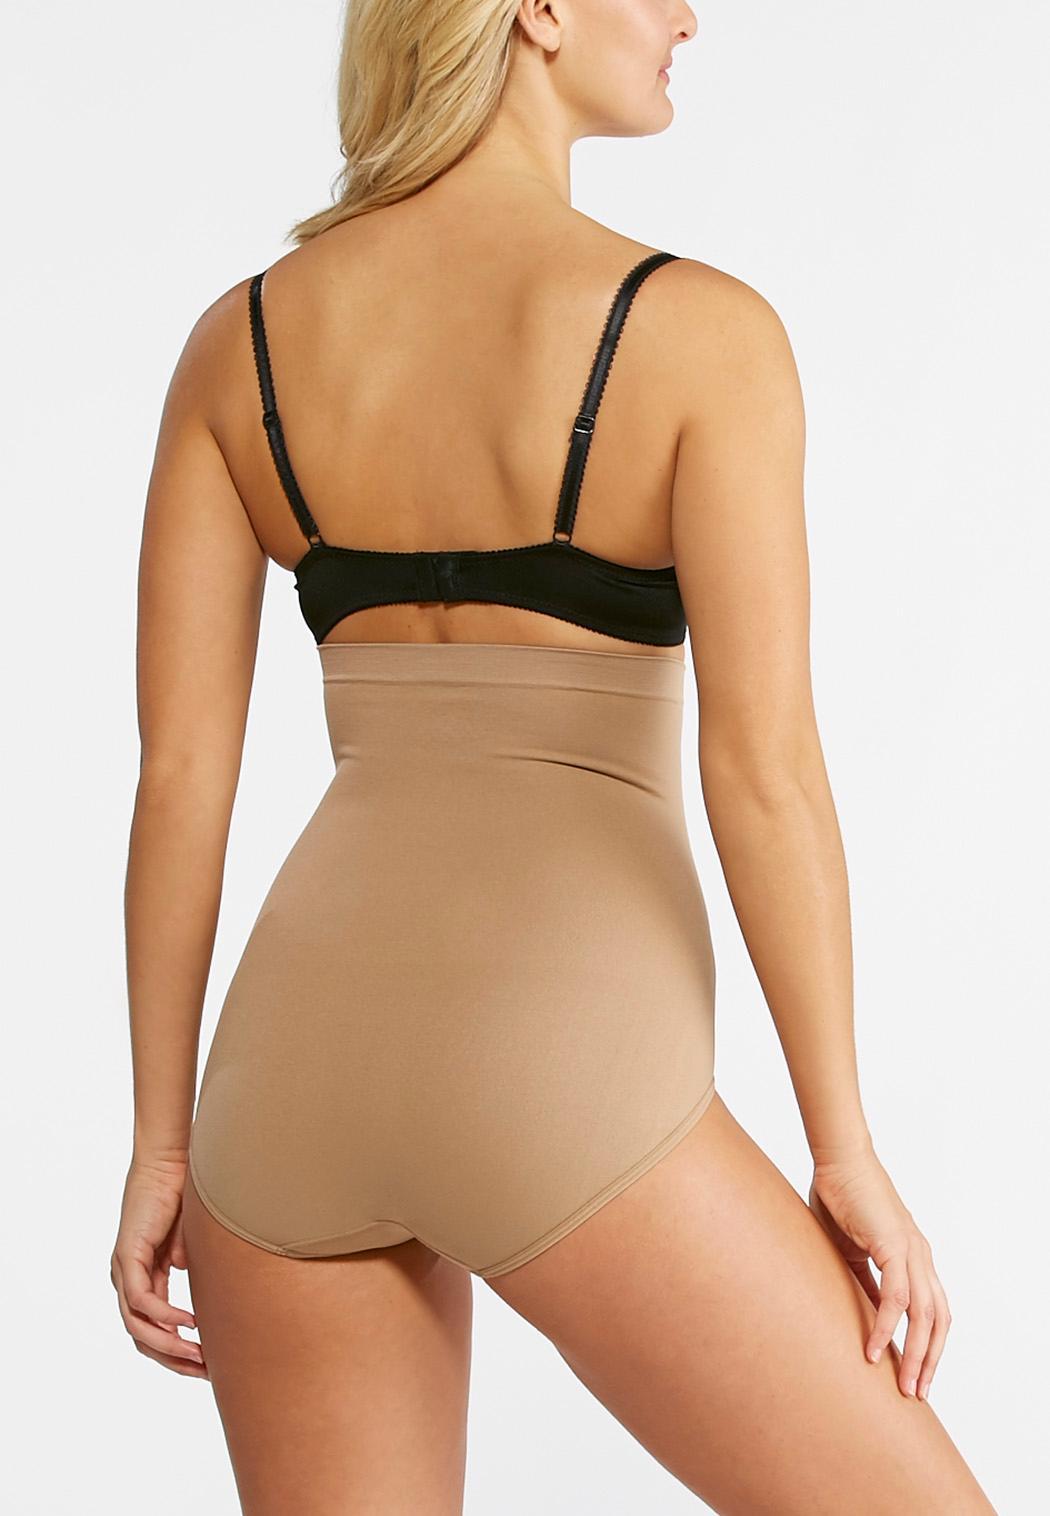 2aff6593d0c6 Nude High Waist Seamless Panties Intimates Cato Fashions